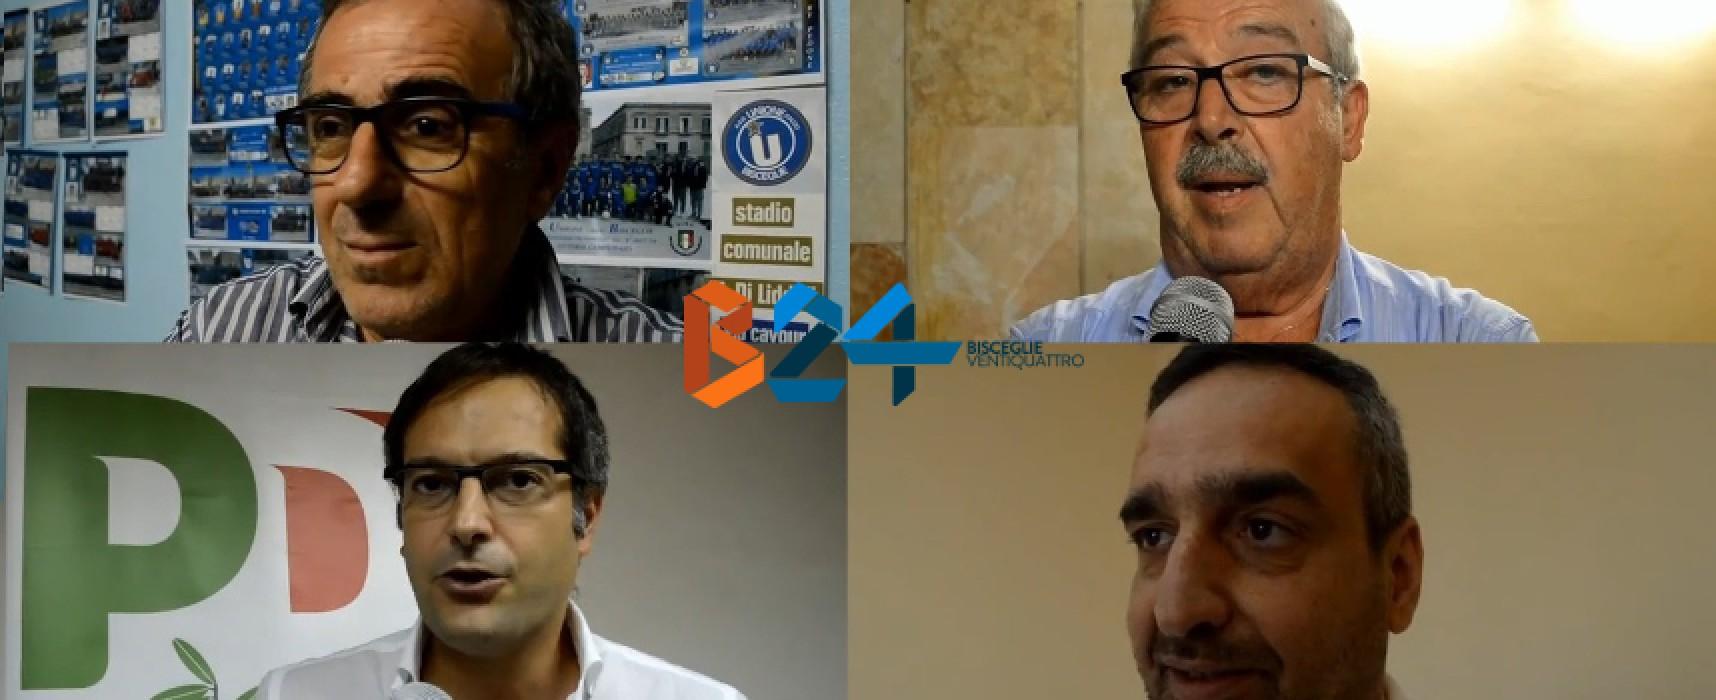 BAT, intervista a Evangelista (PdCI), Valente (SC), Angarano (PD) e Fata (Ncd) / VIDEO